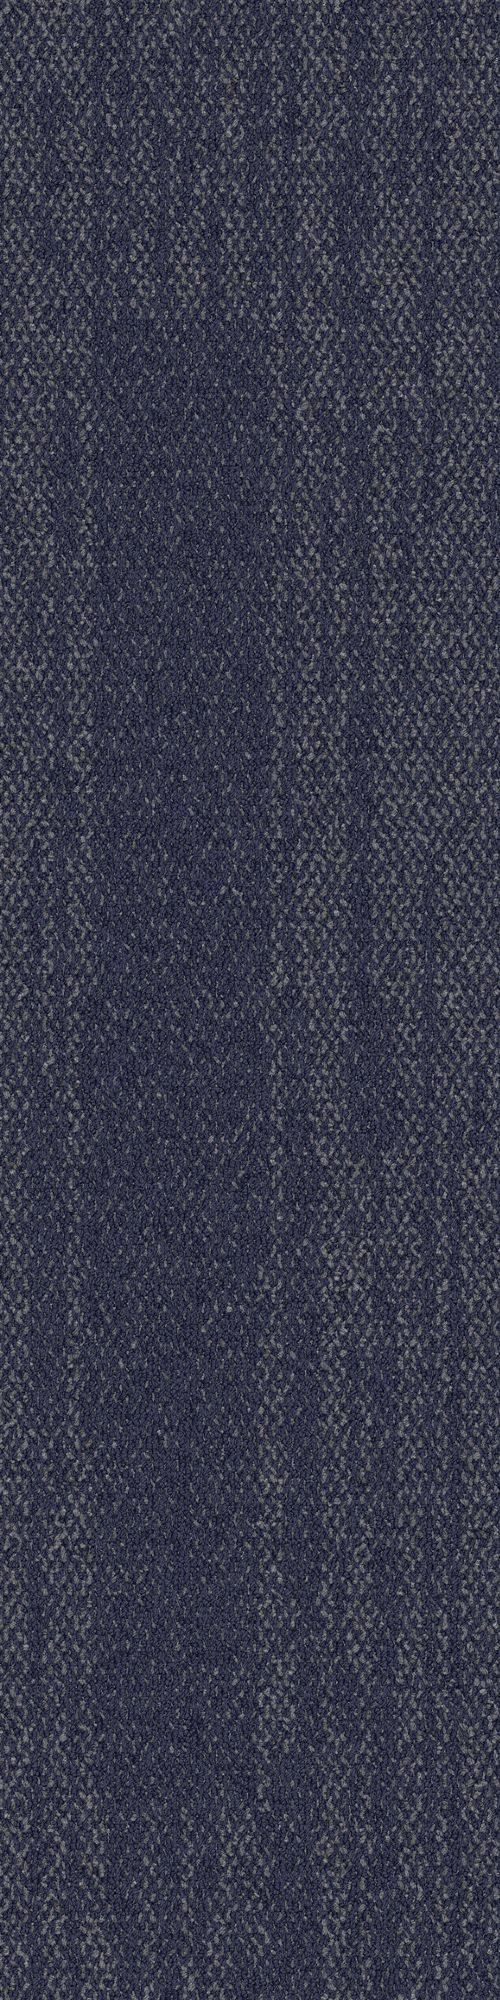 Interface carpet tile: Riverside Color name: Cape